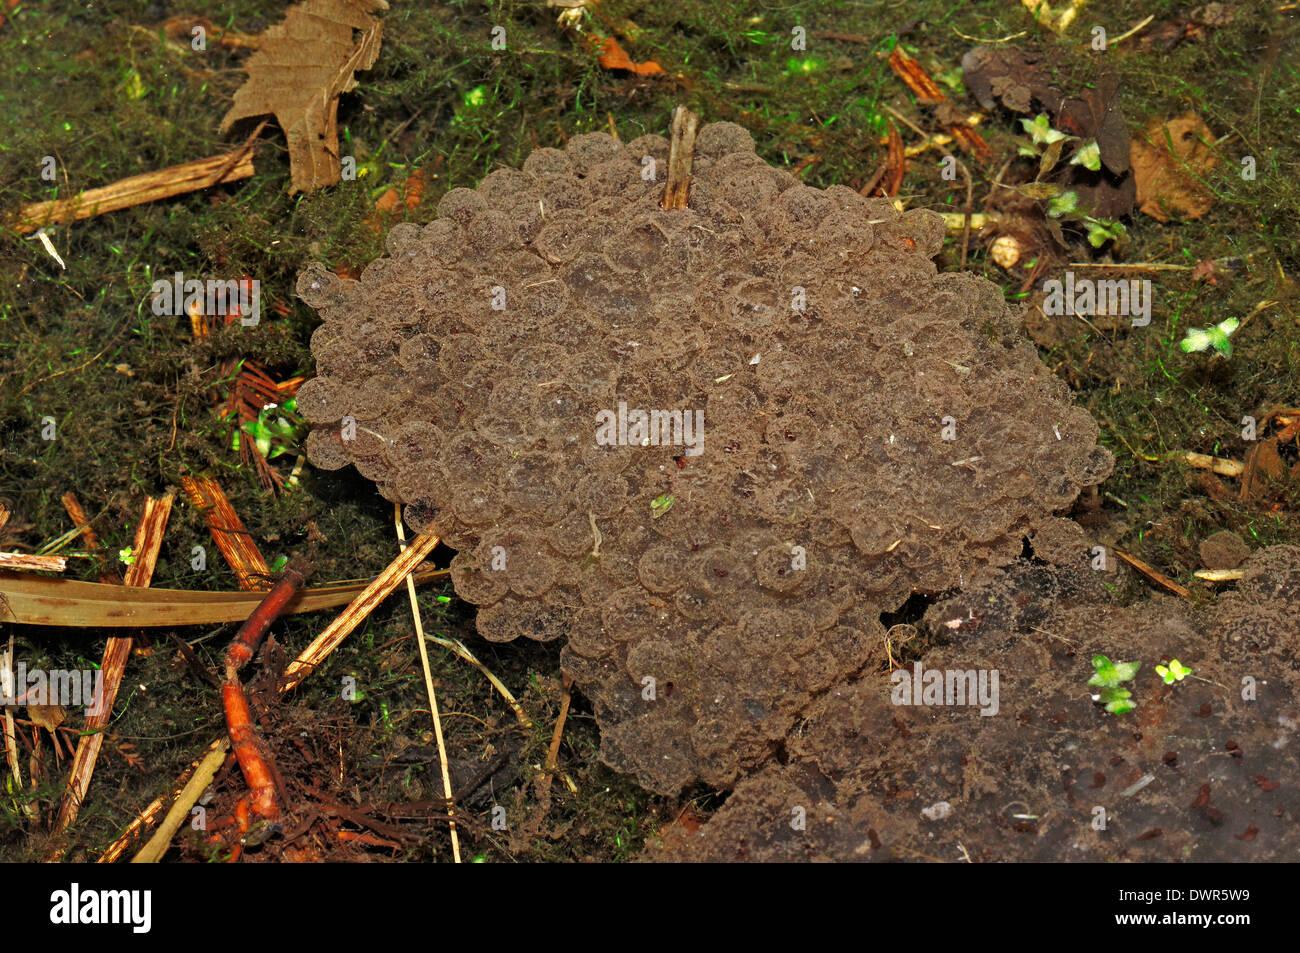 European Common Frog or European Common Brown Frog (Rana temporaria), spawn, North Rhine-Westphalia, Germany - Stock Image